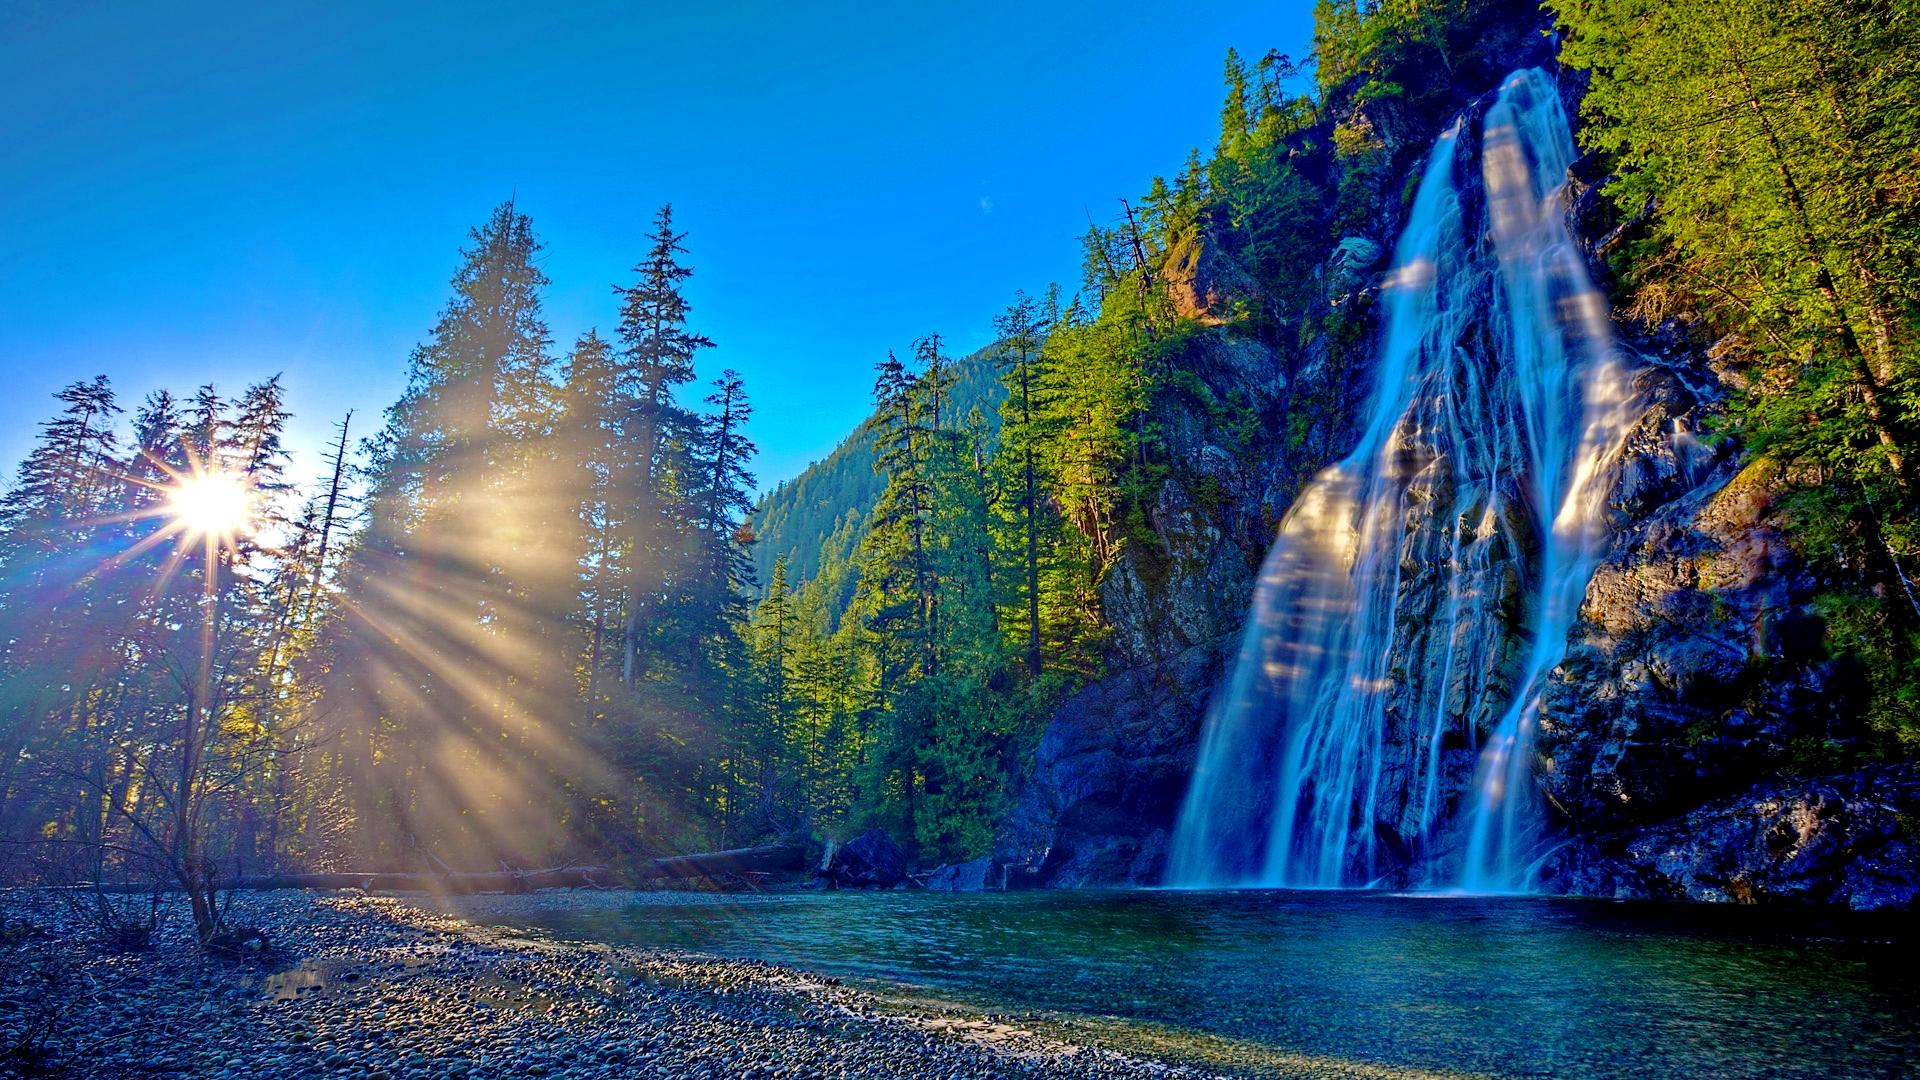 Waterfall At Sunrise HD Wallpaper